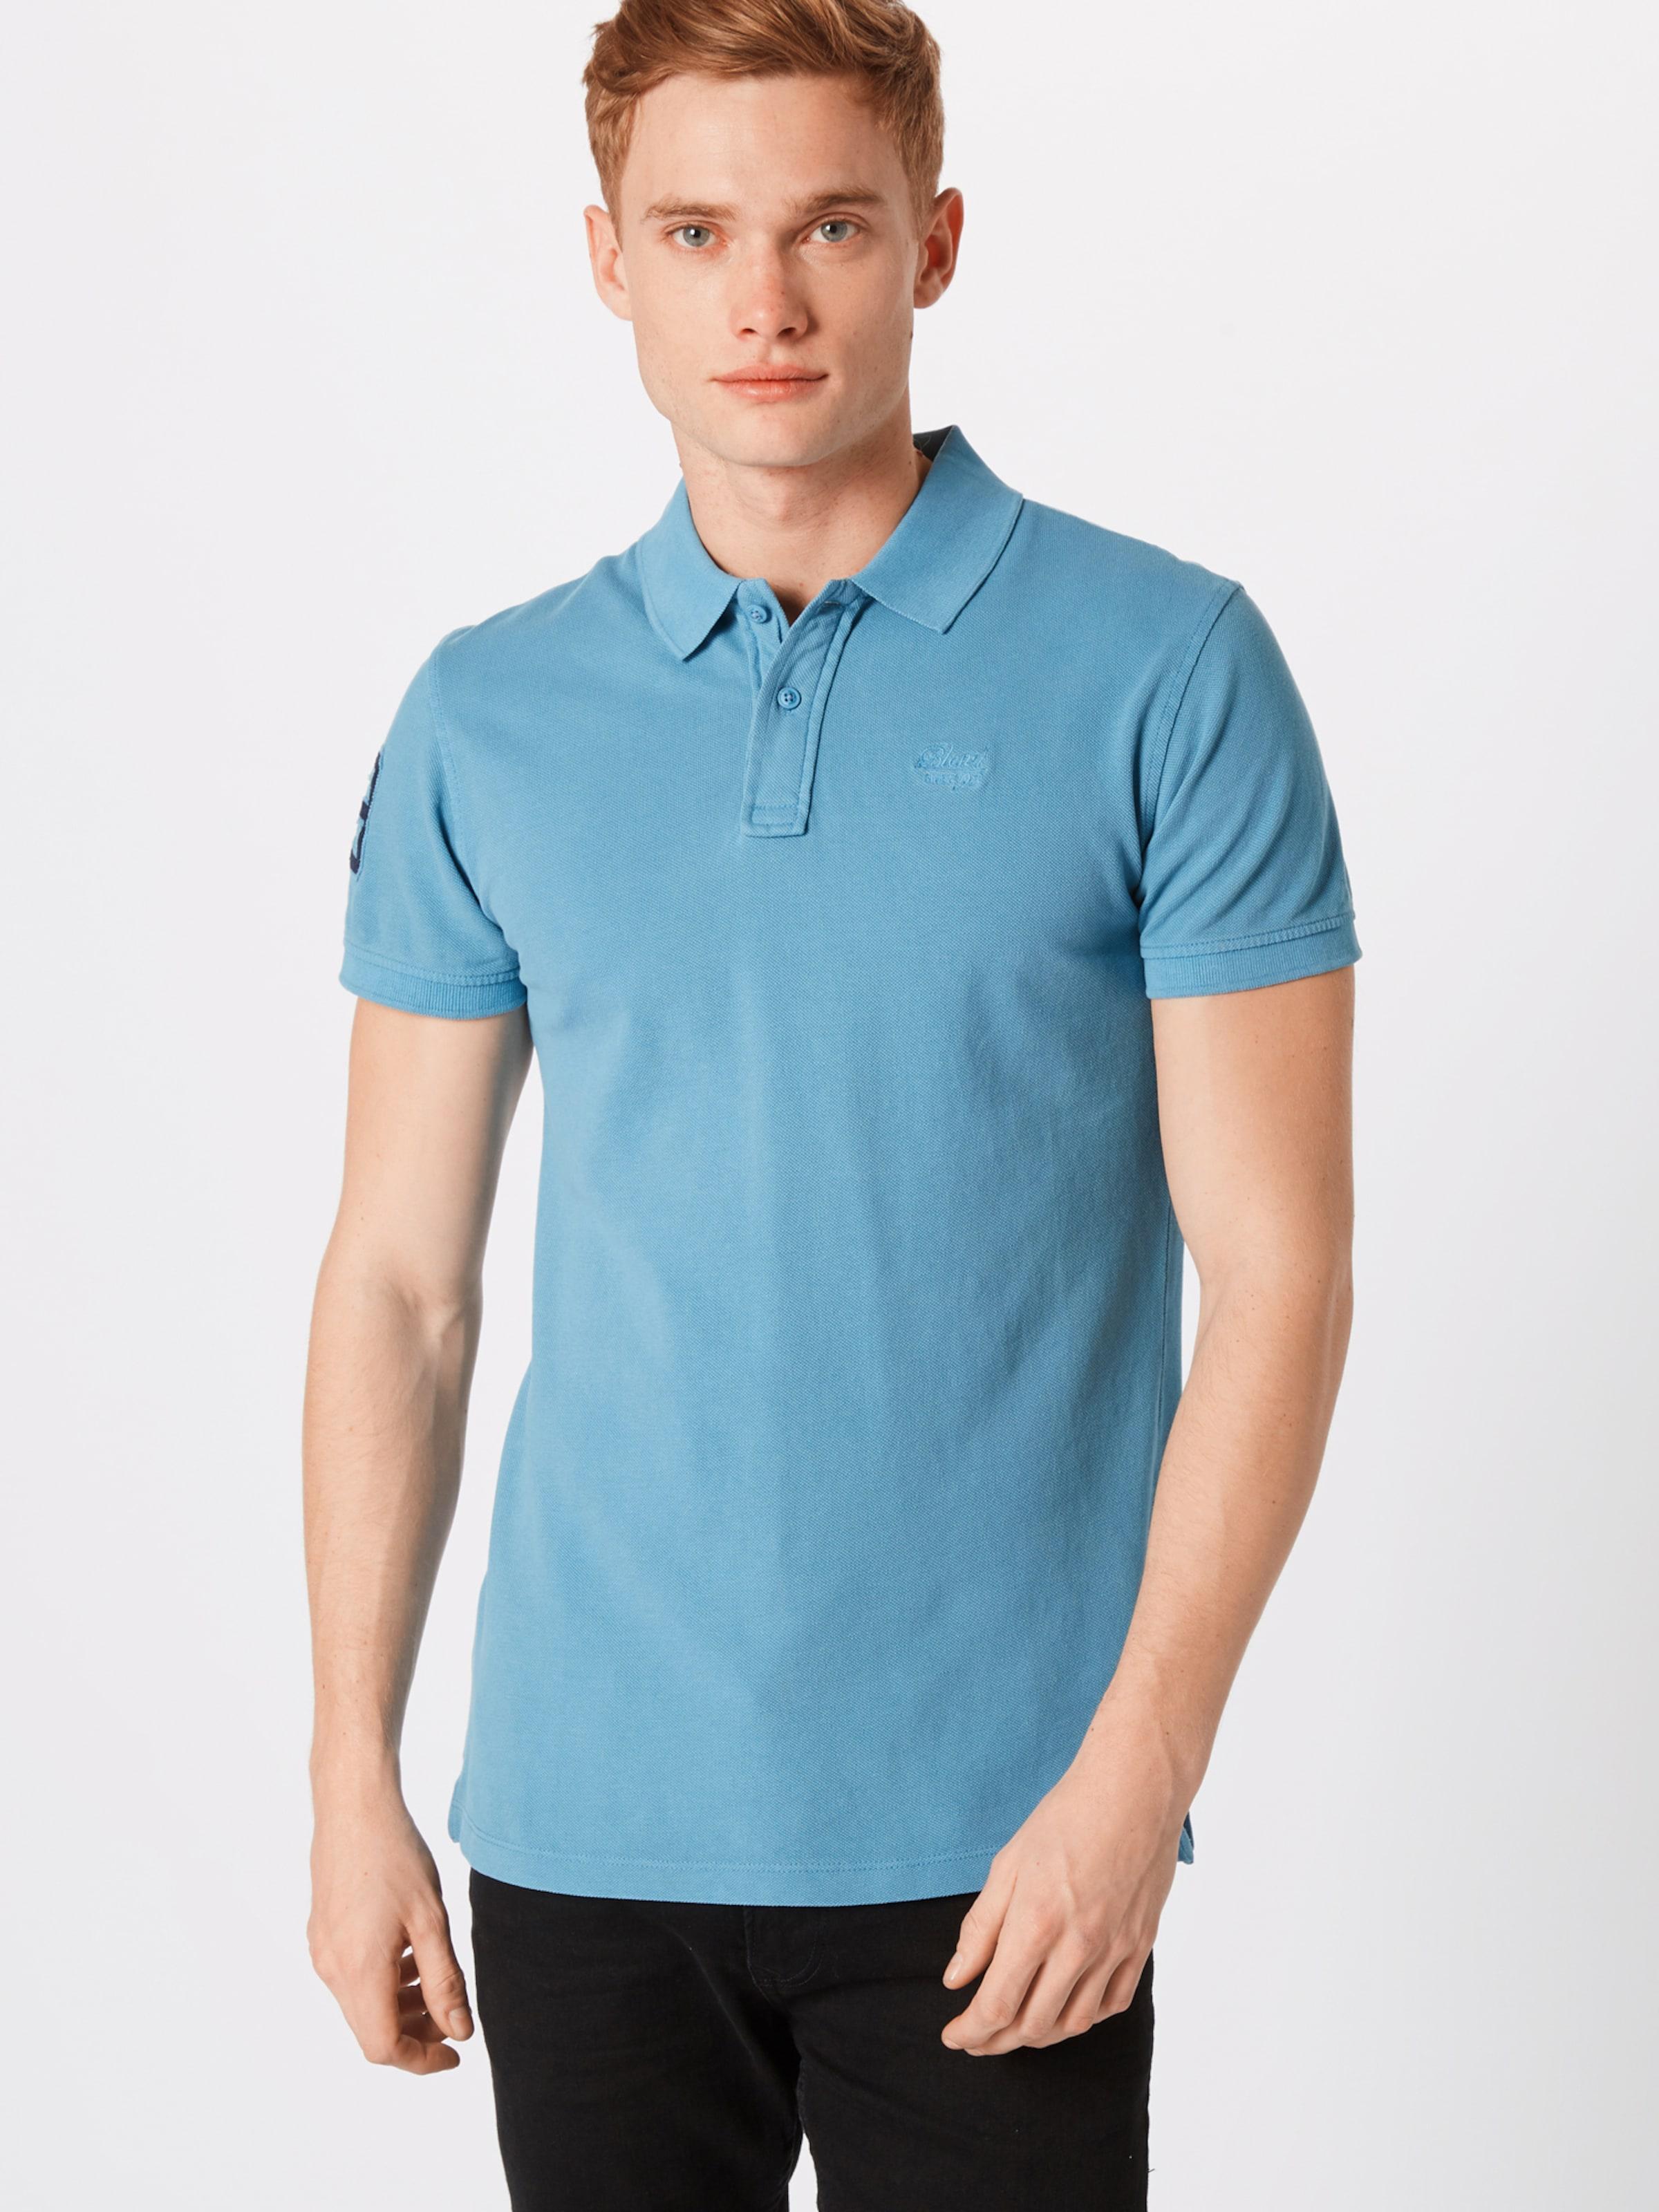 Lichtblauw Shirt Blend Blend Shirt In 'tee' Blend Lichtblauw In 'tee' U1HwOWqx5E